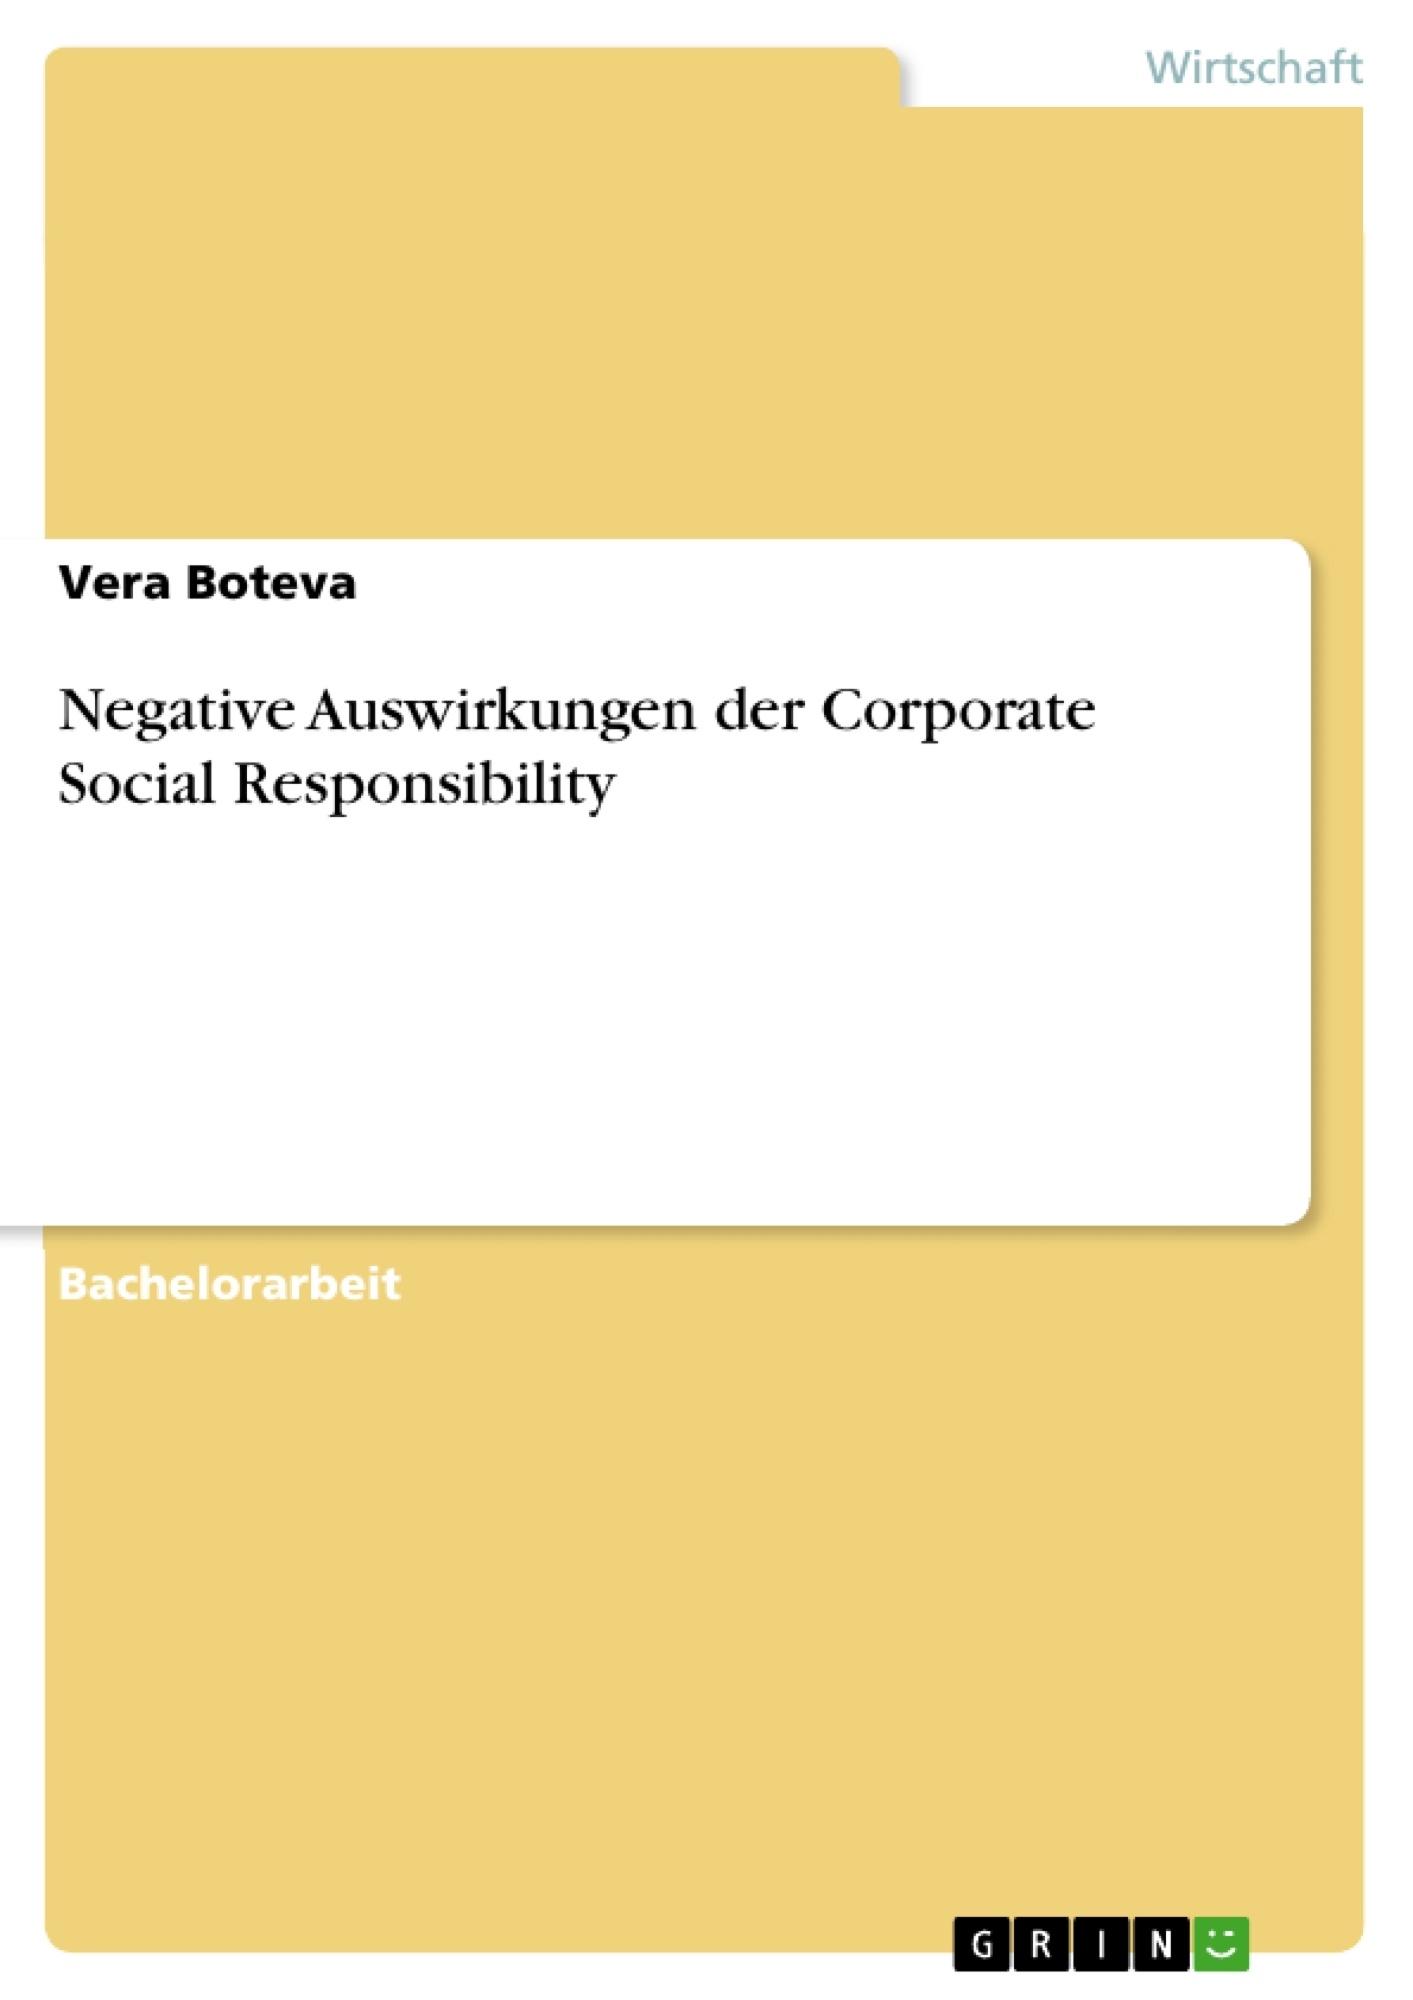 Titel: Negative Auswirkungen der Corporate Social Responsibility